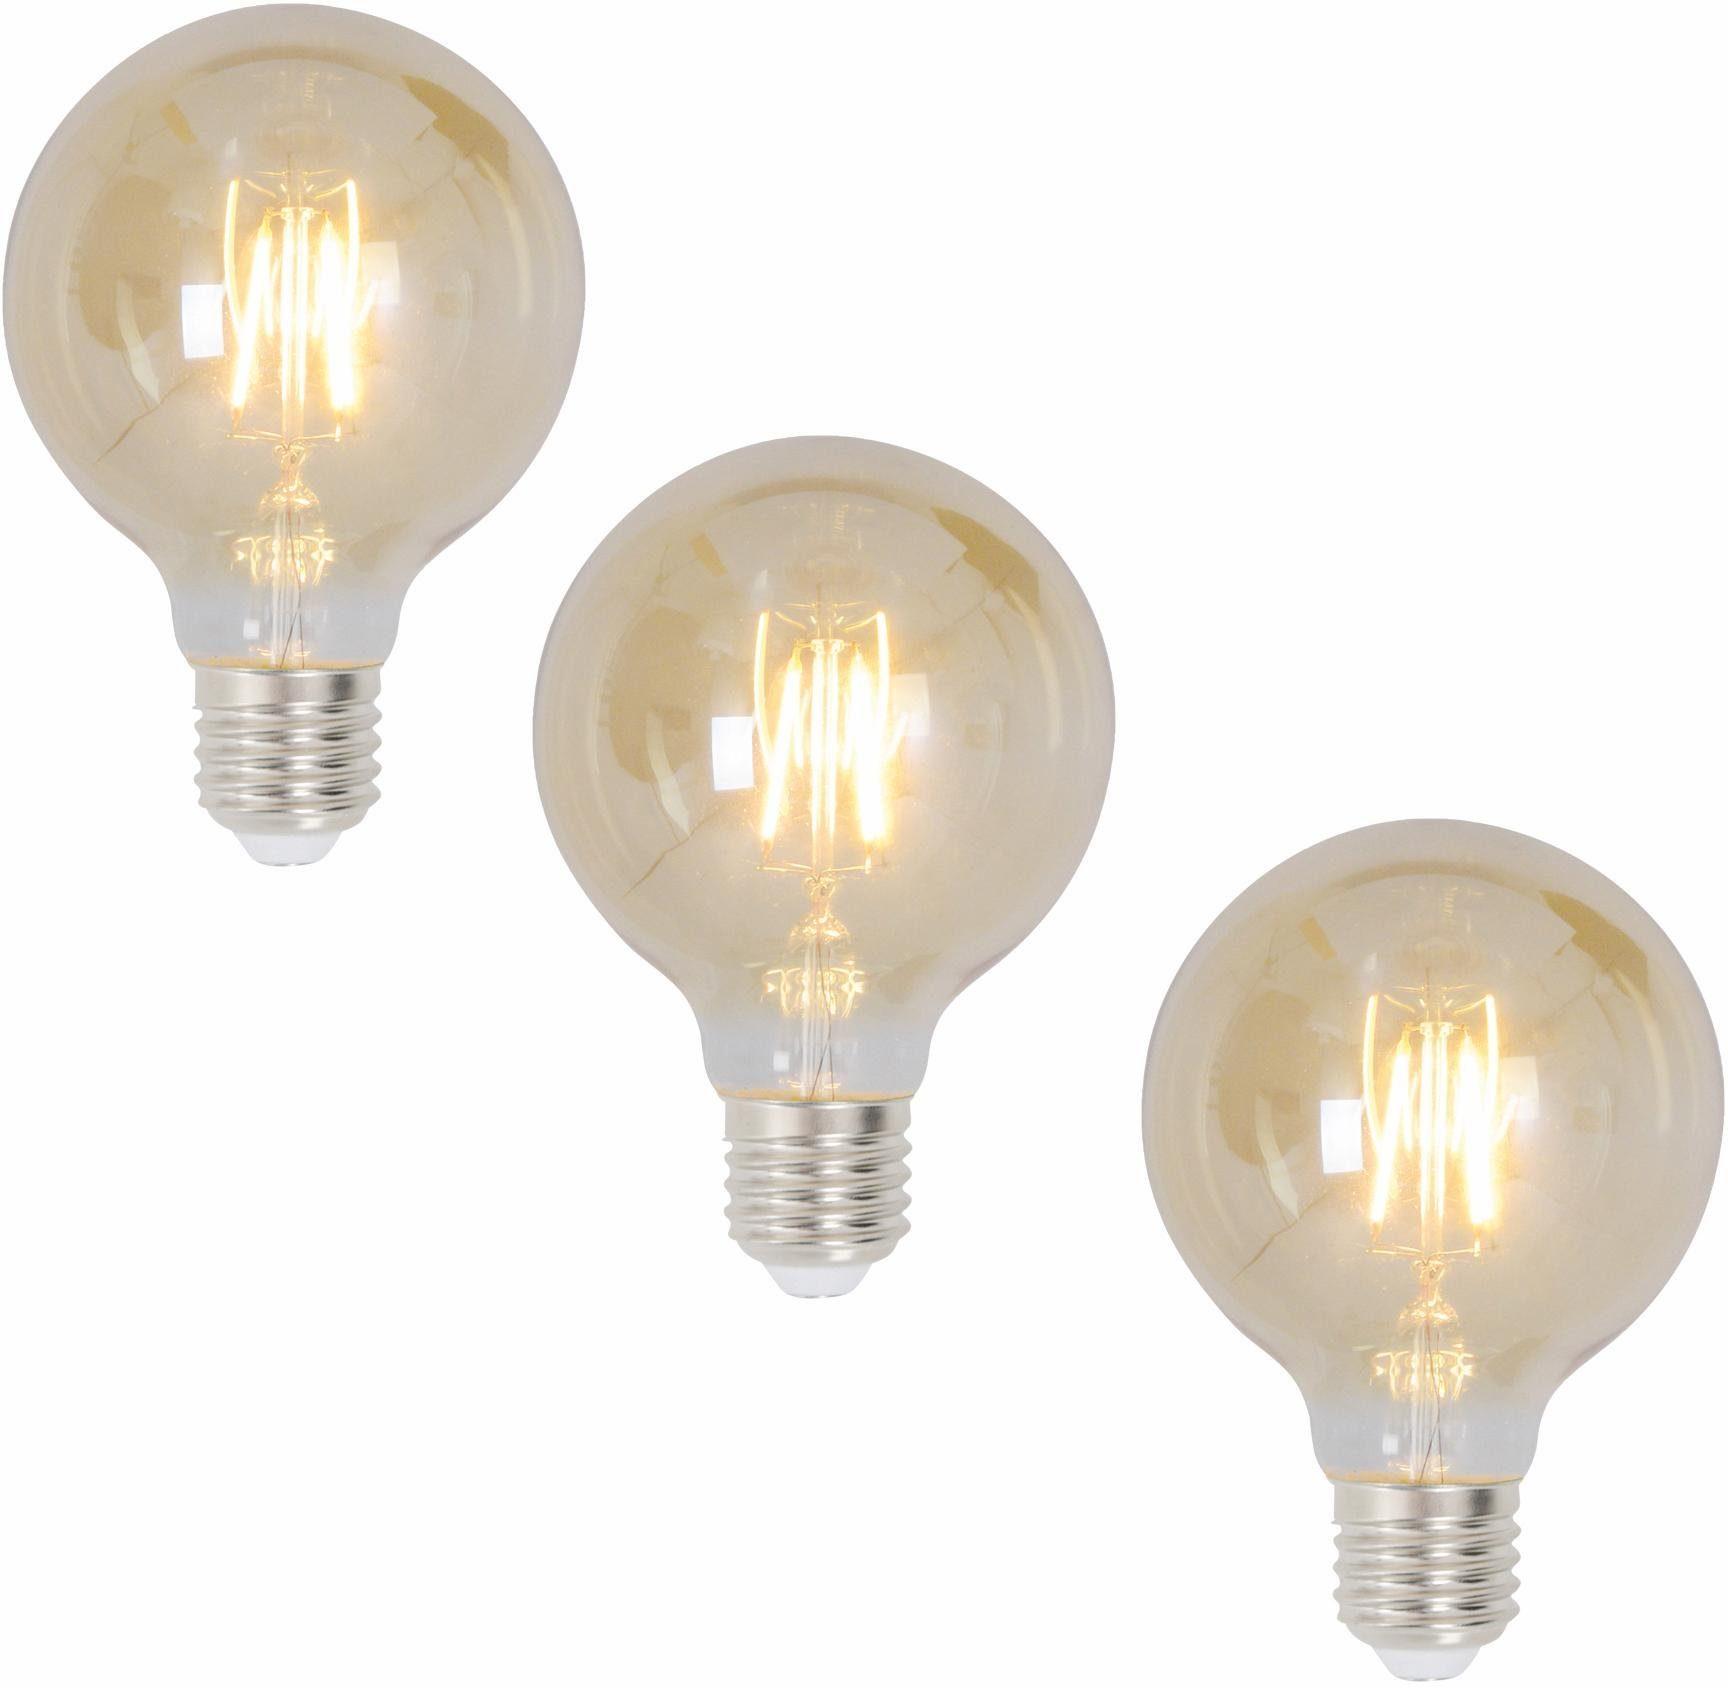 näve »E27 Filament« LED-Leuchtmittel, E27, 3 Stück, Warmweiß